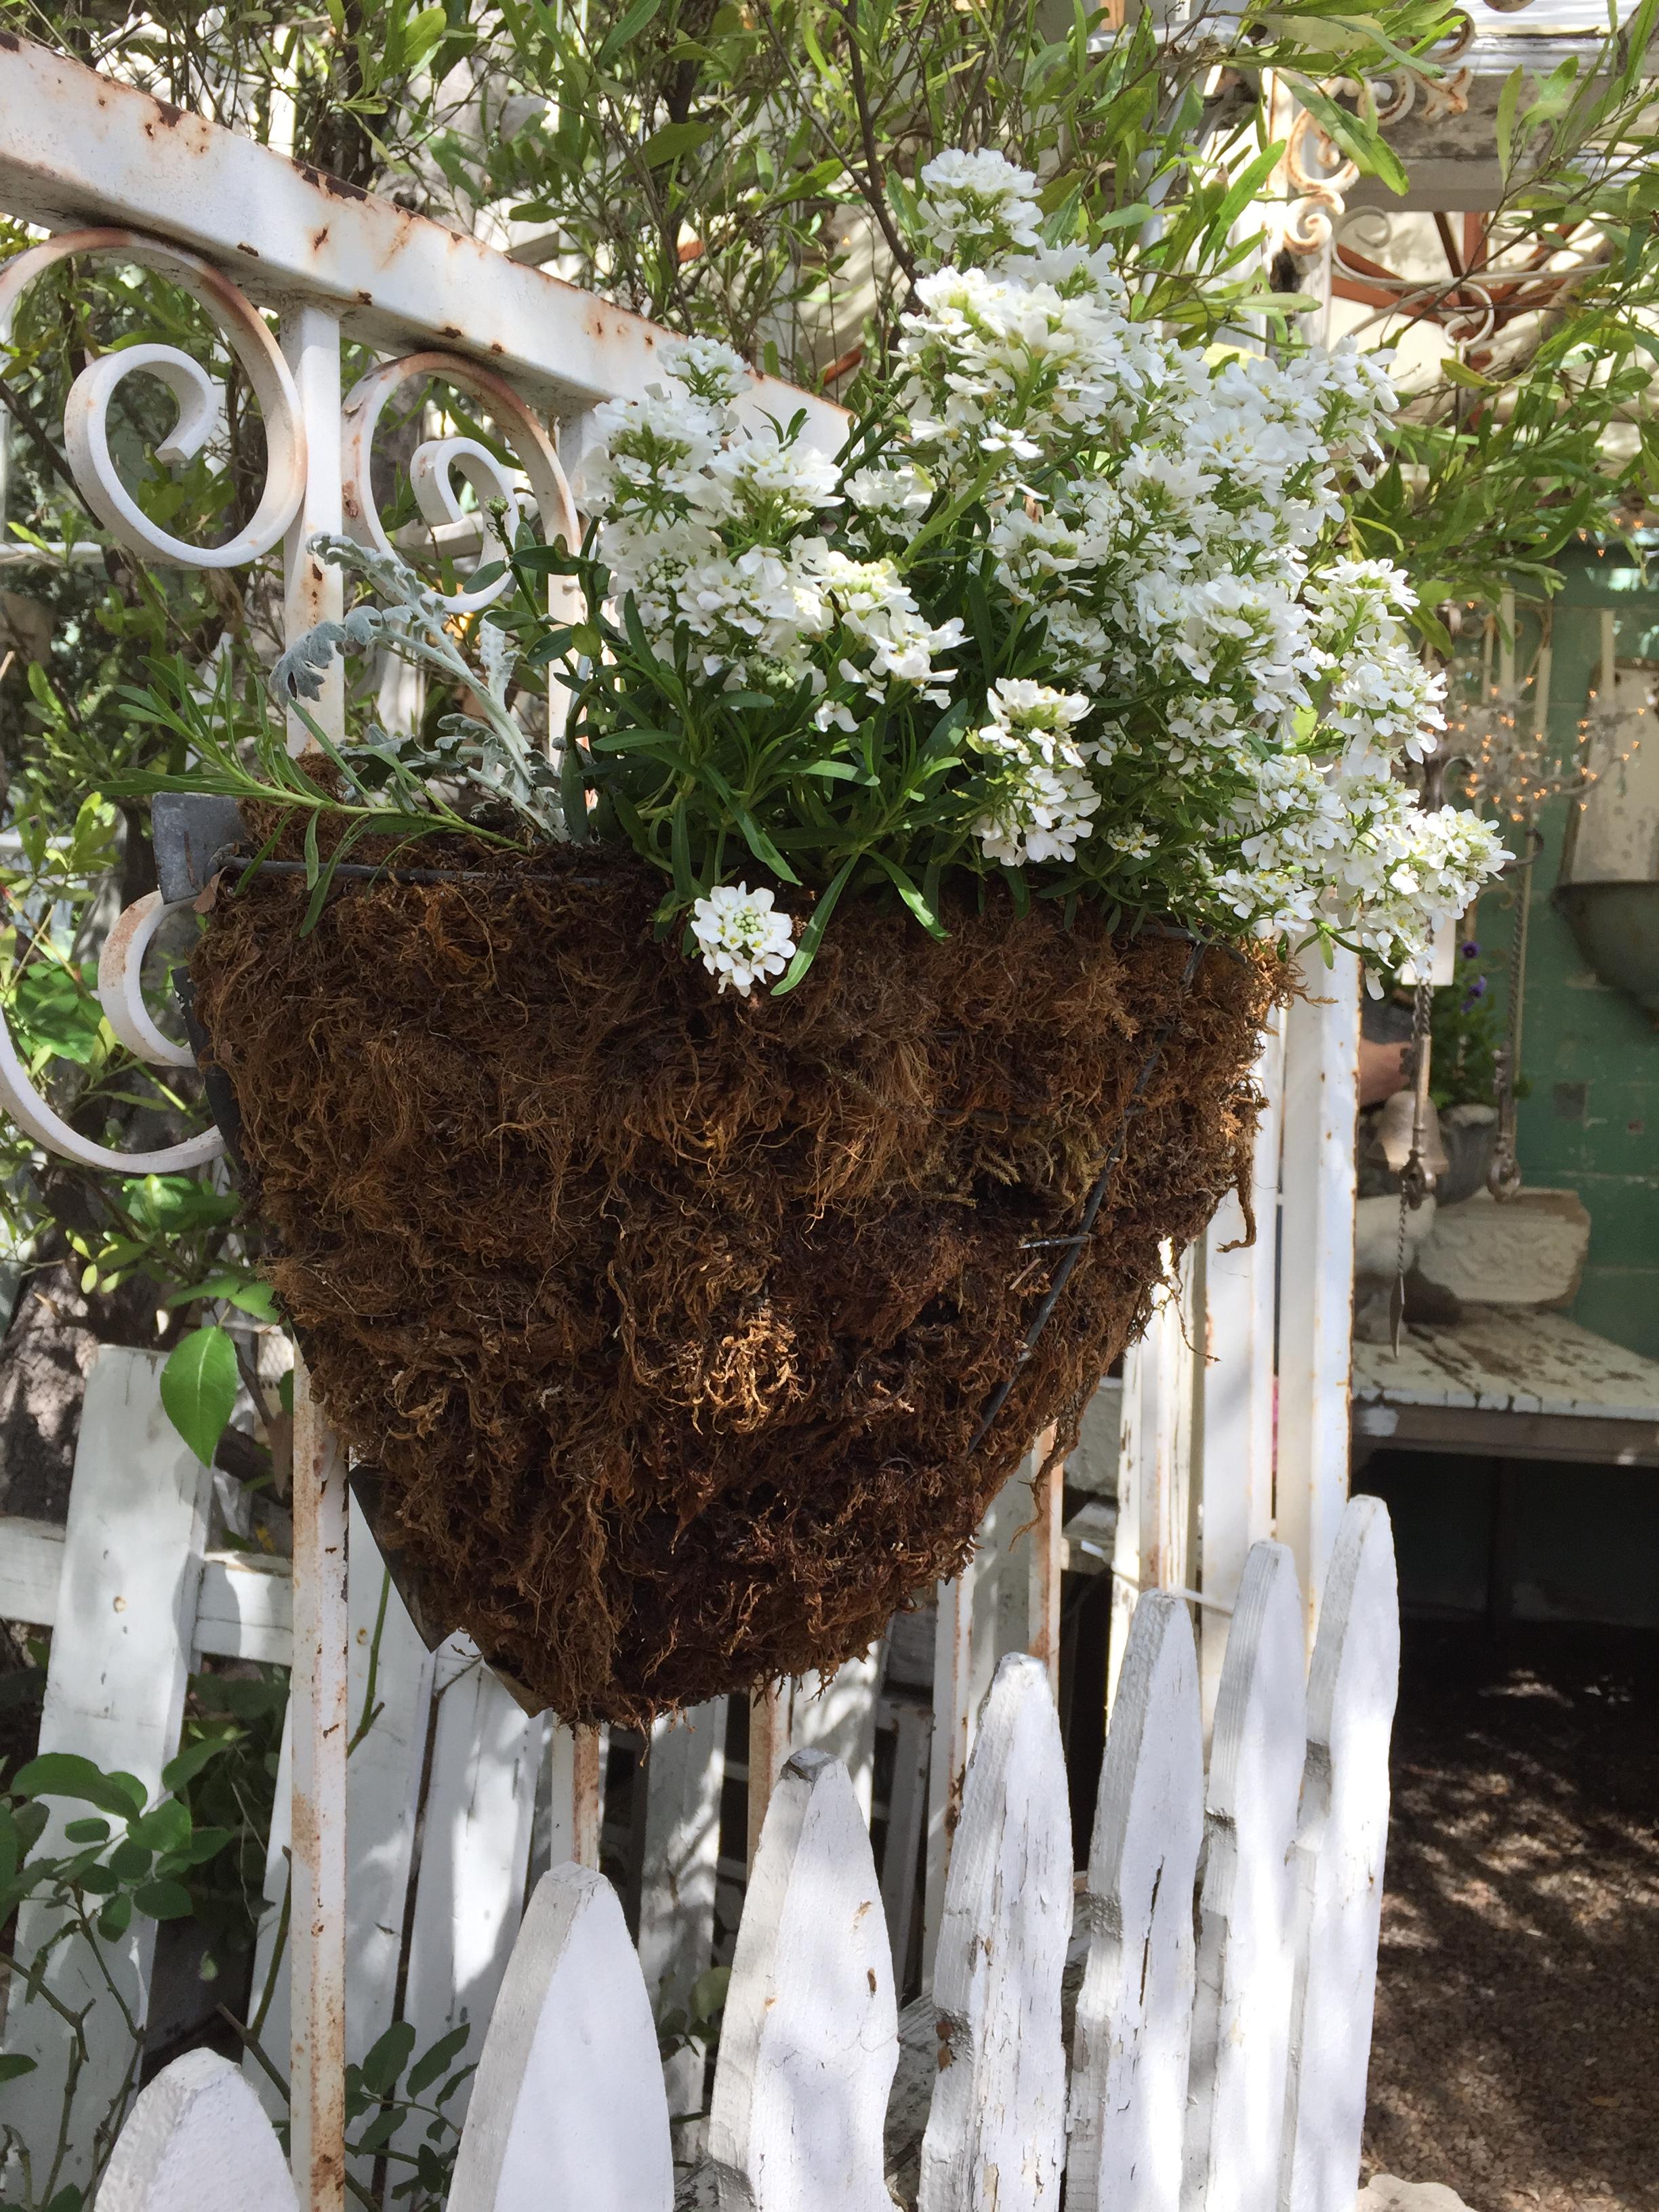 White Flower Basket on Fence - Orange 2018-3-9